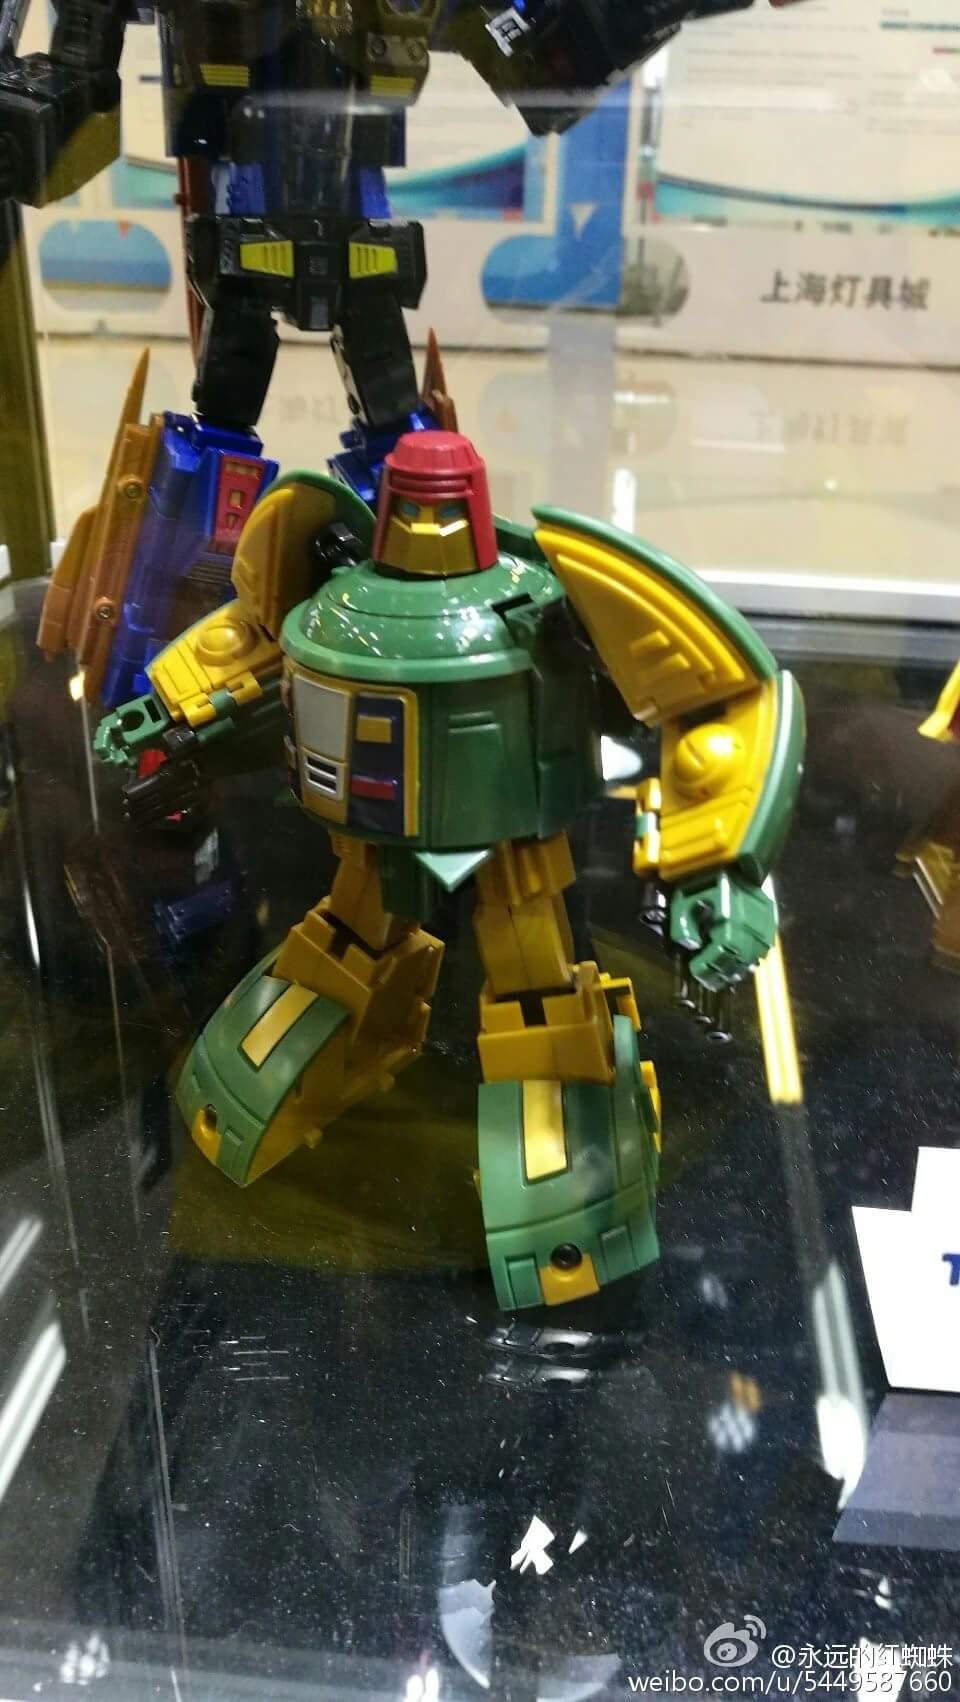 [Toyworld][Zeta Toys] Produit Tiers - Minibots MP - Gamme EX - Page 2 XRiQylF0